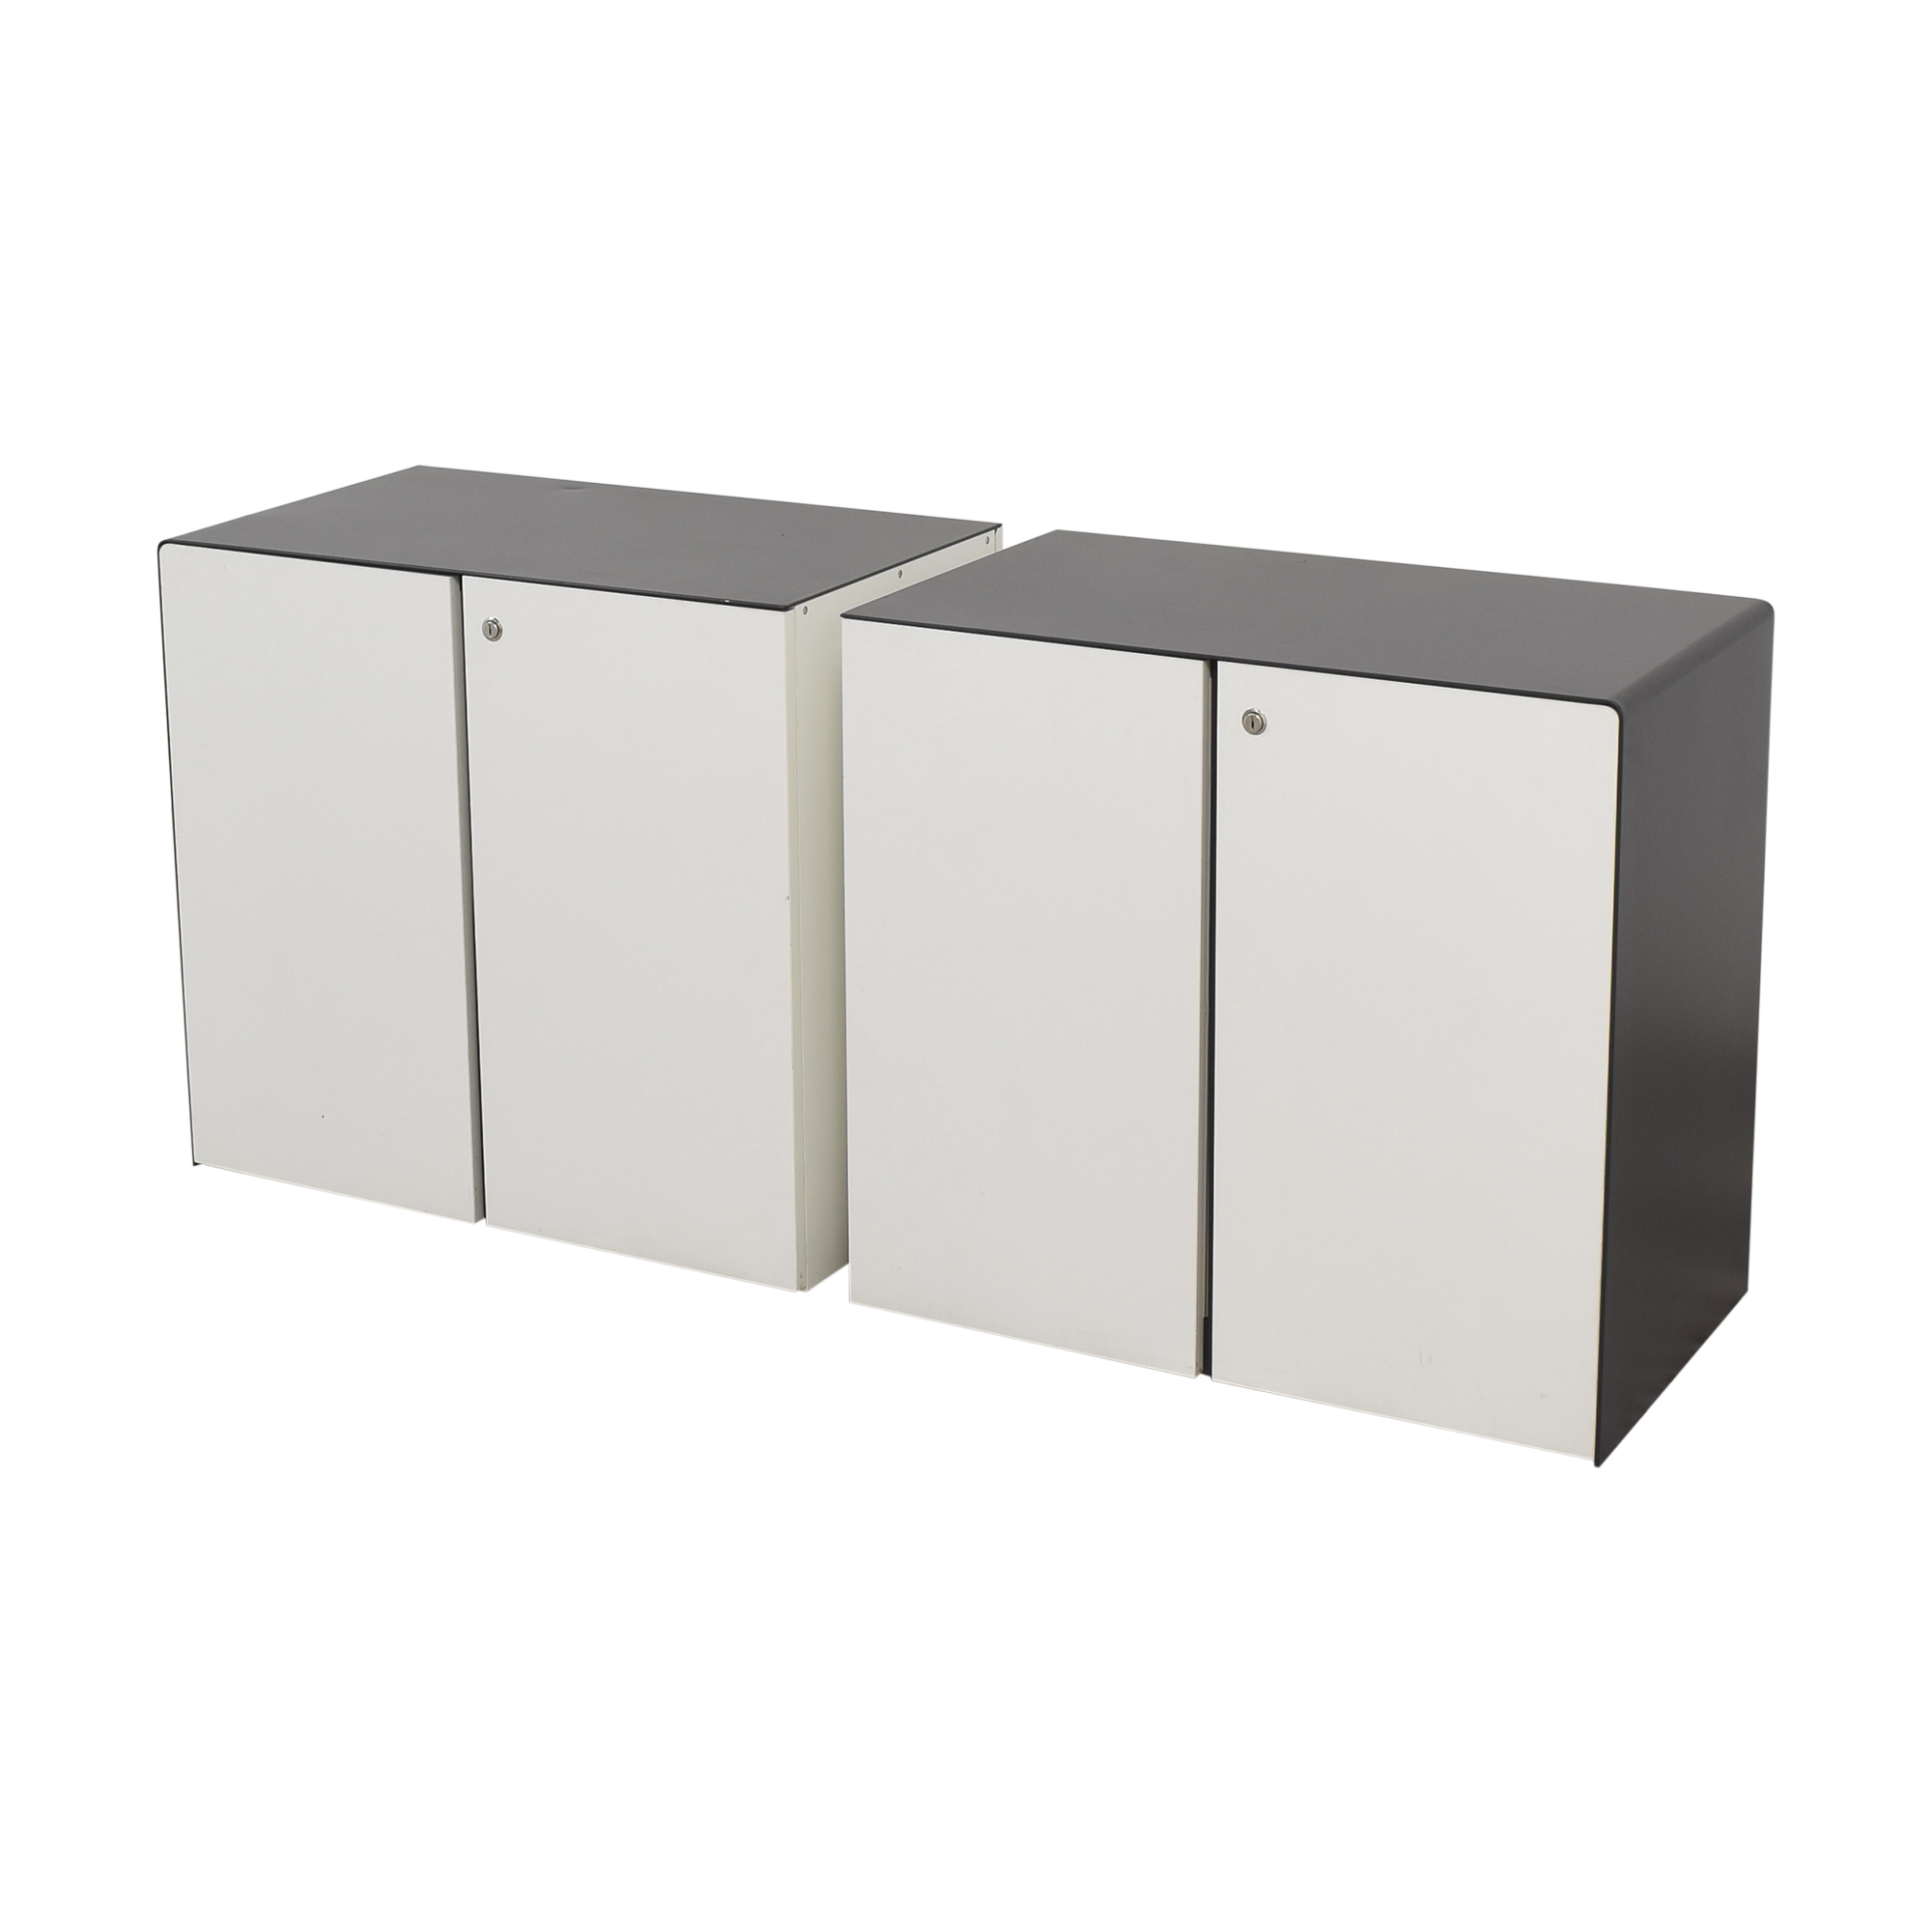 shop Koleksiyon Koleksiyon Song S2 Small Storage Cabinets online